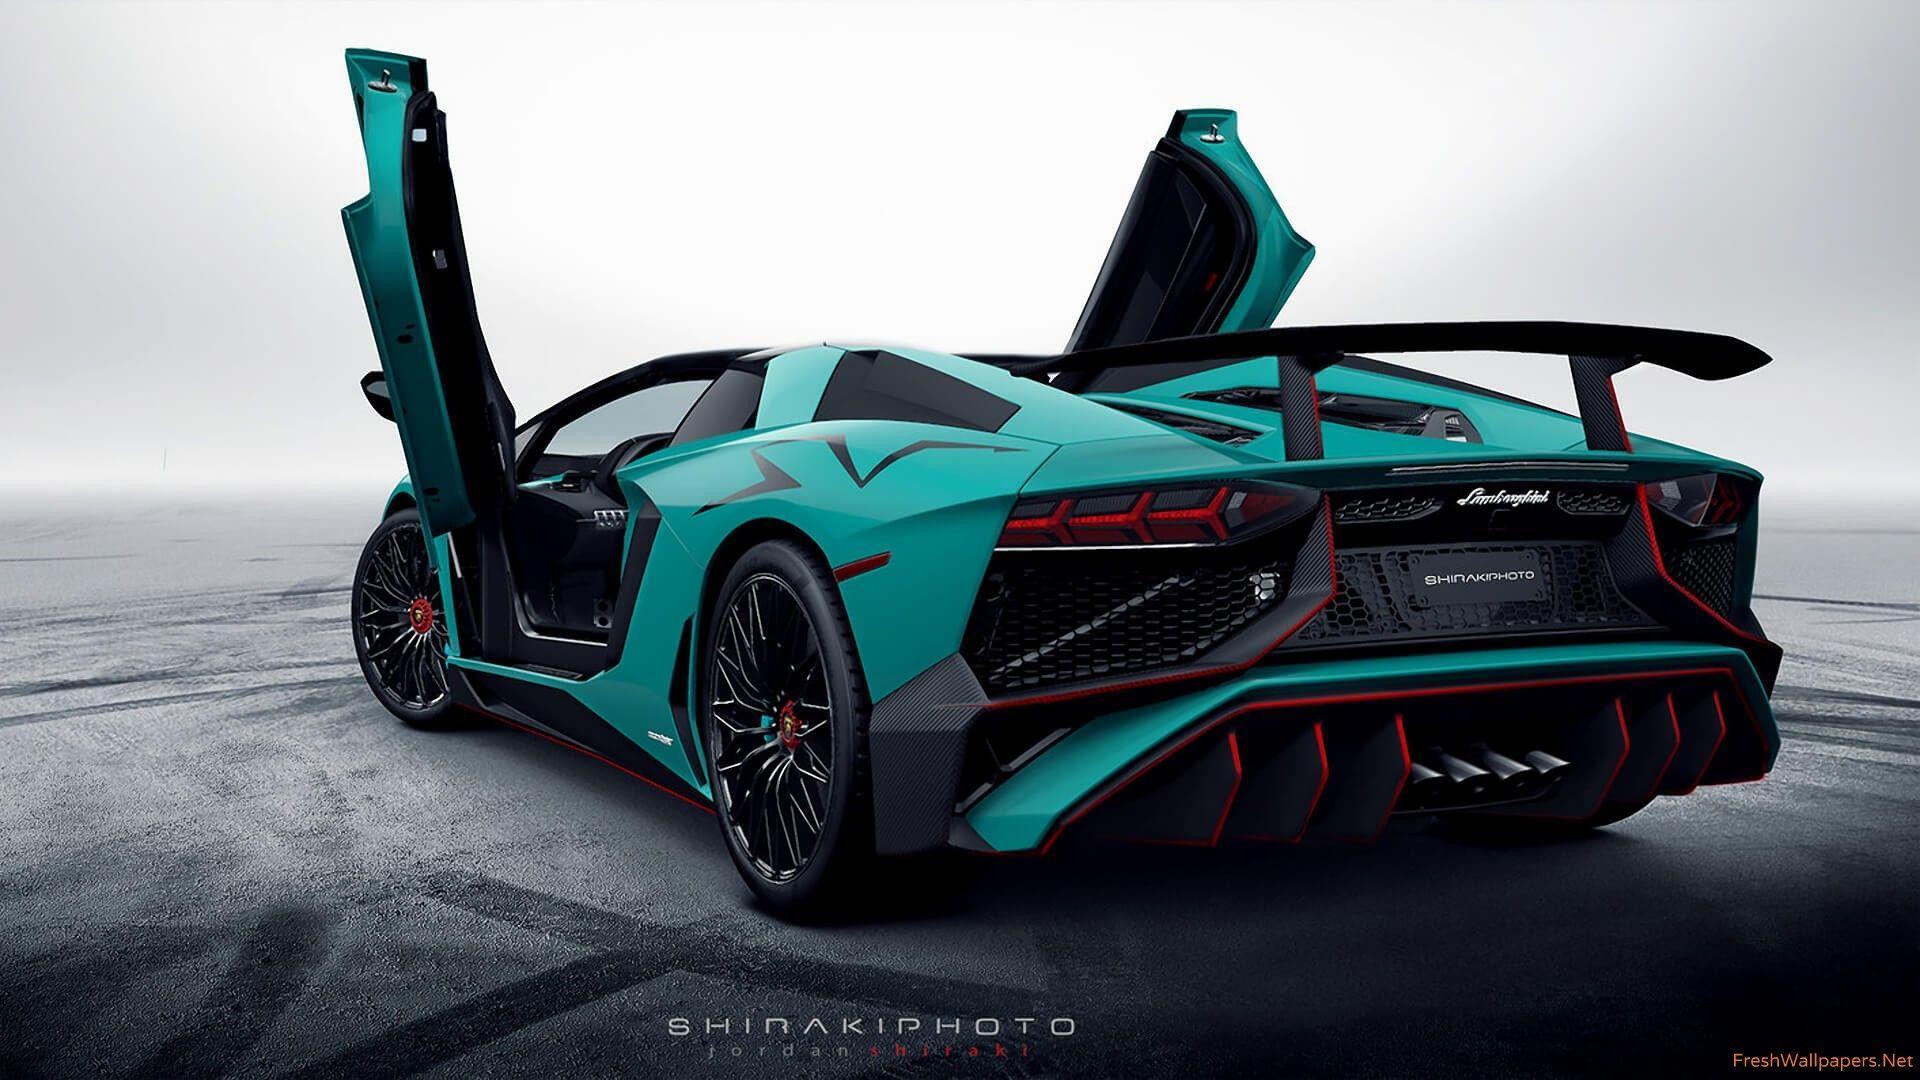 Lamborghini Aventador Sv Wallpapers Wallpaper Cave